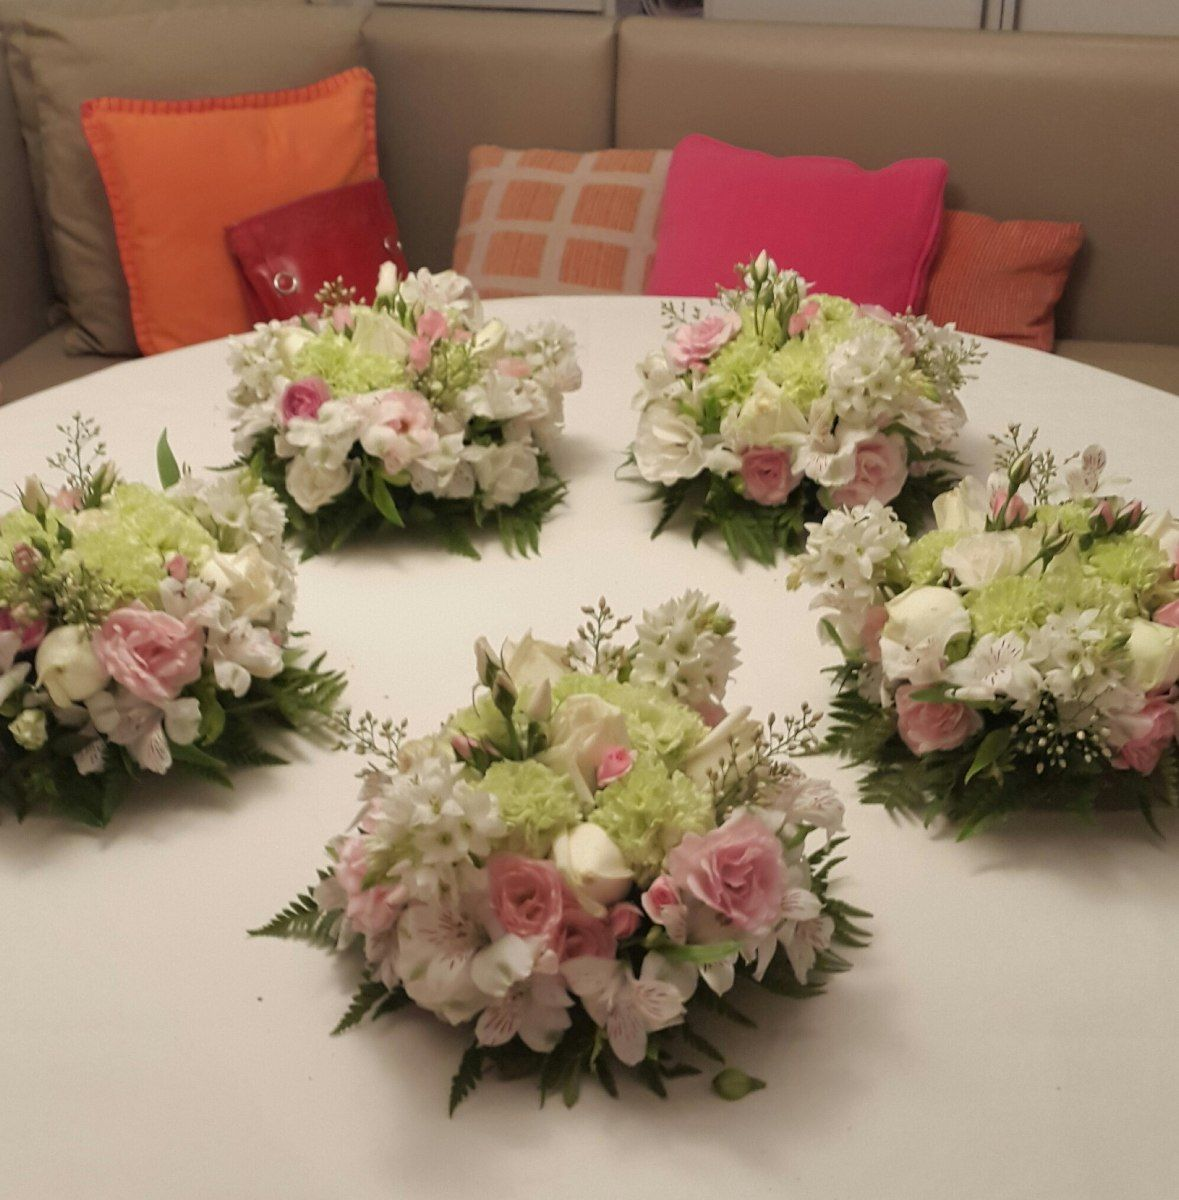 decoracion con flores para primera comunion  Buscar con